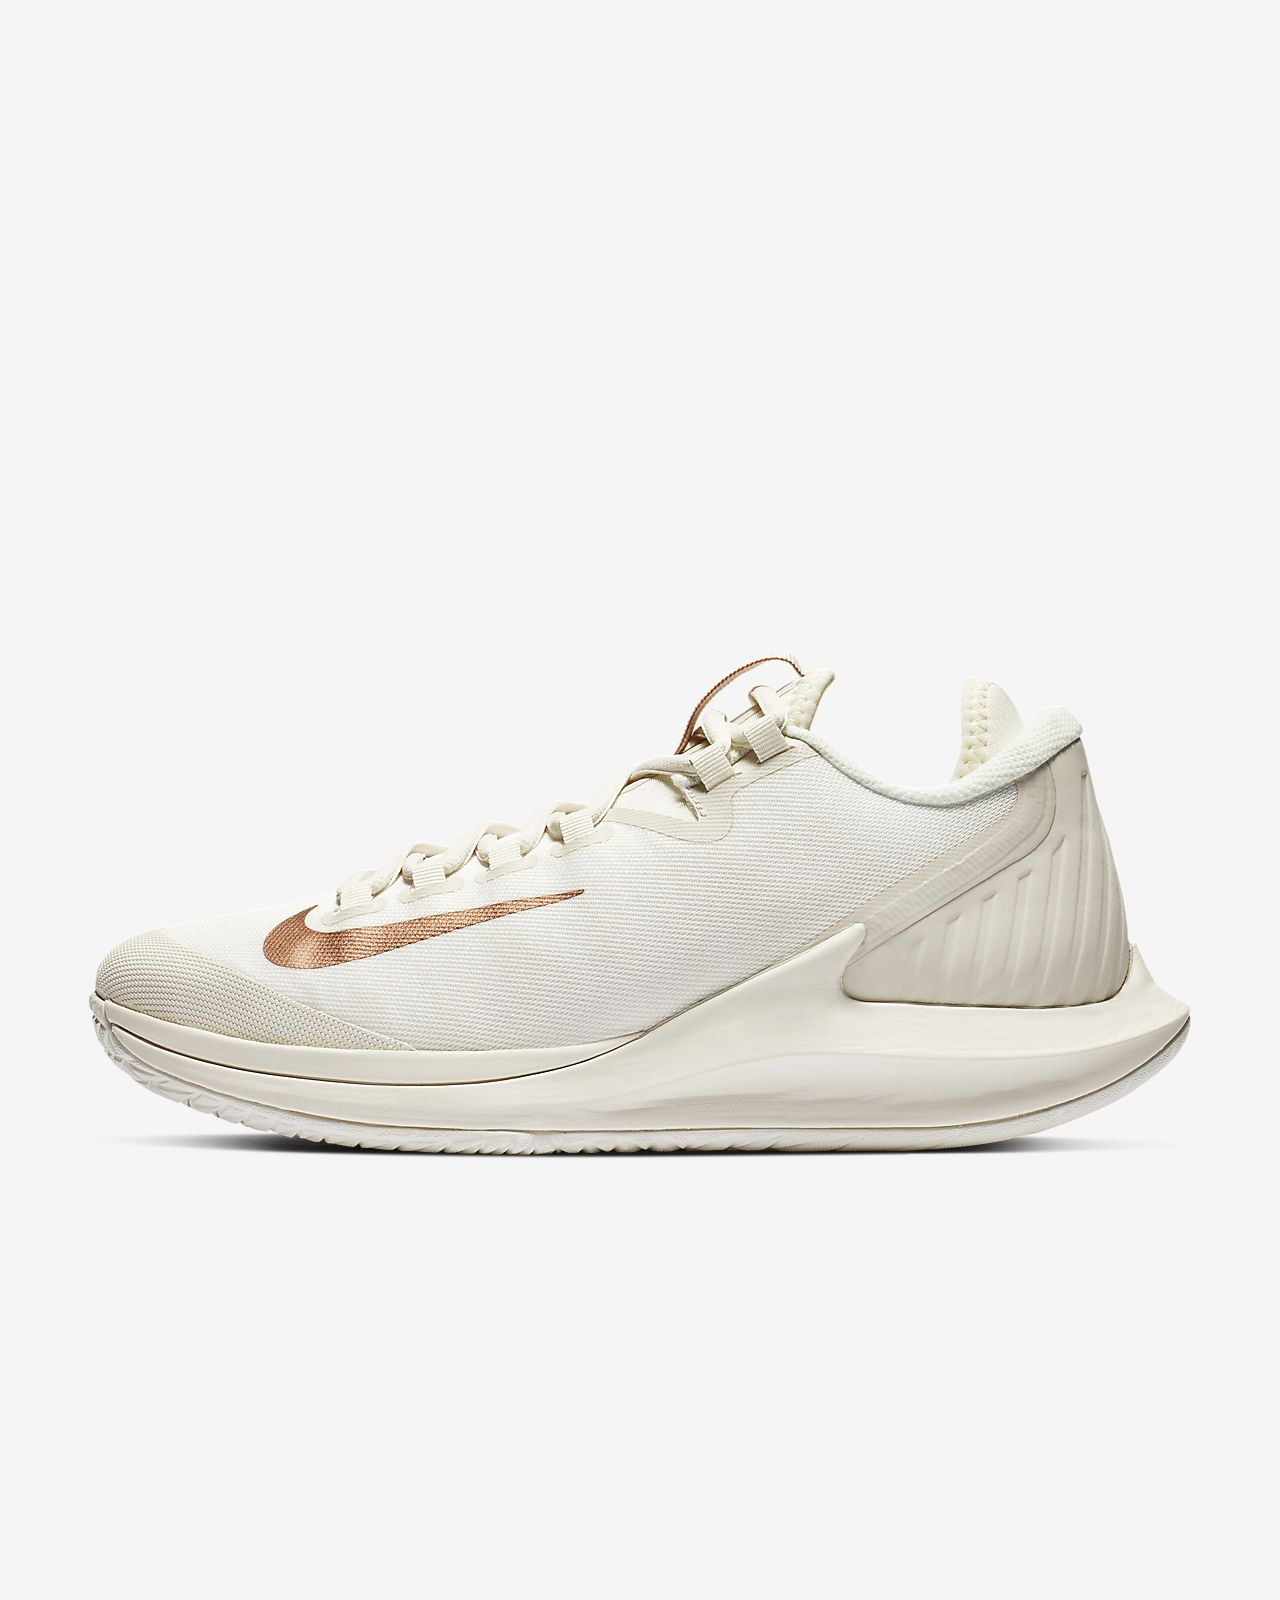 NikeCourt Air Zoom Zero Women's Tennis Shoe